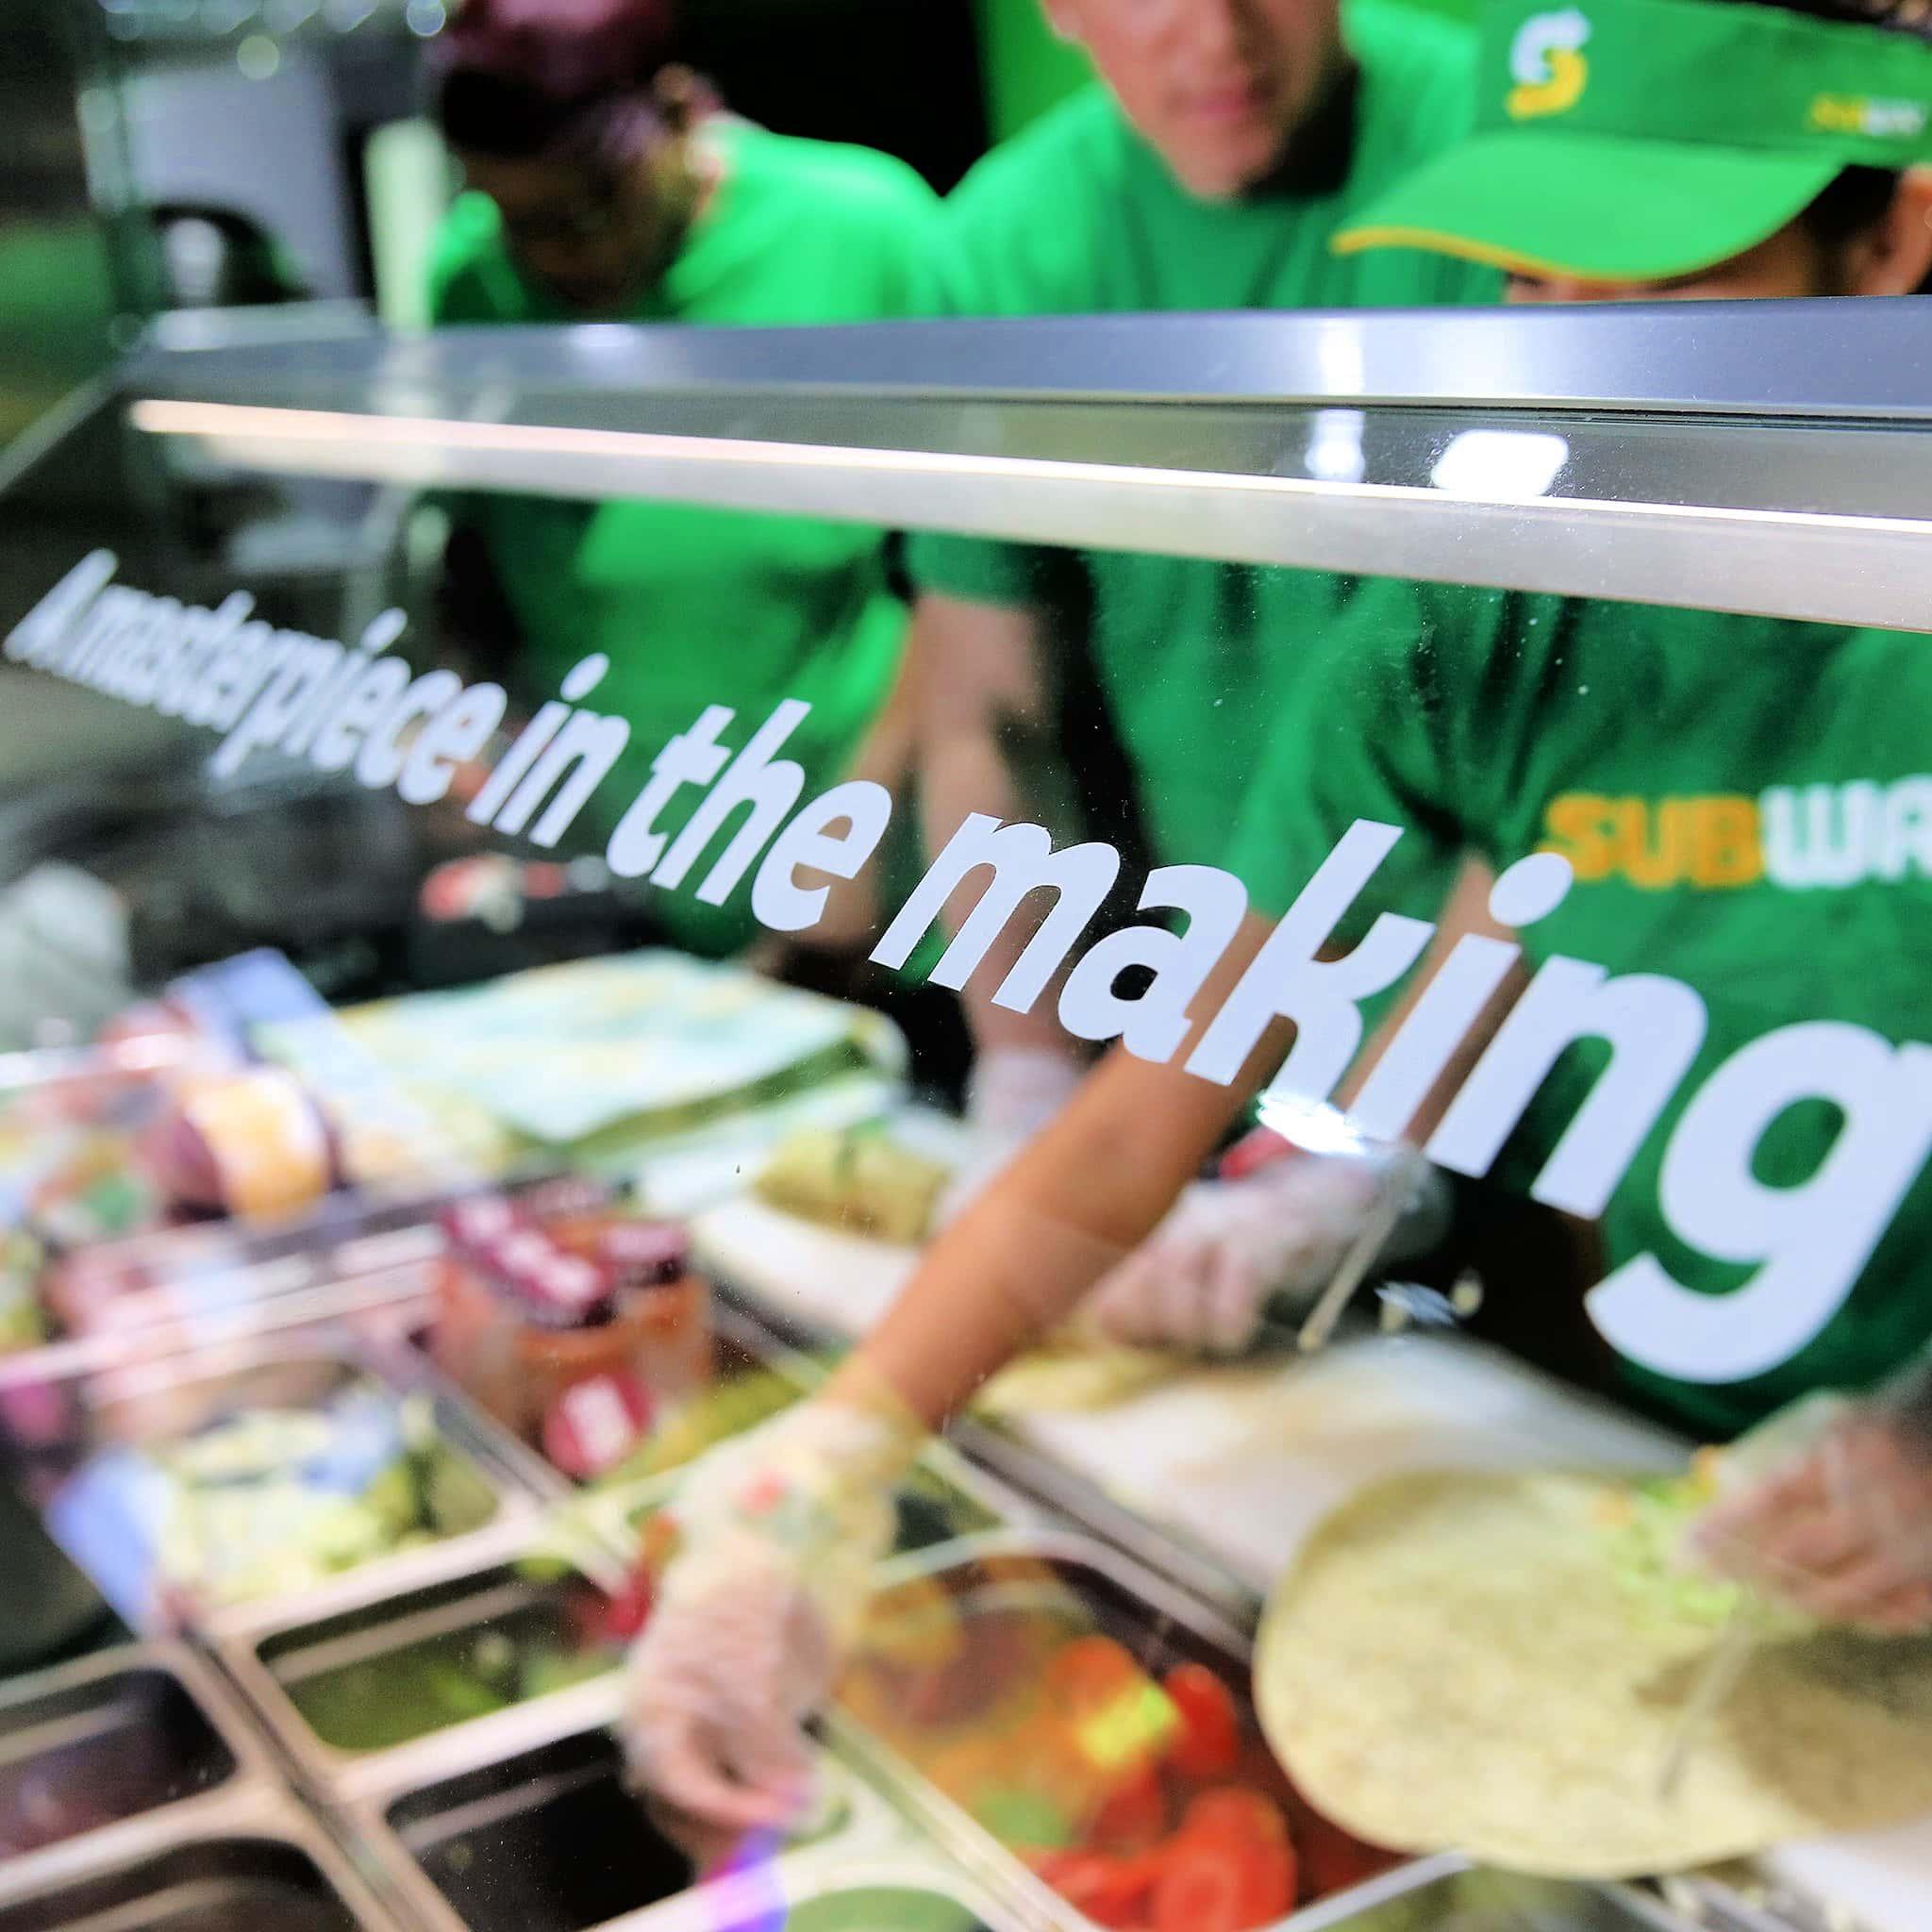 subway veggies and toppings